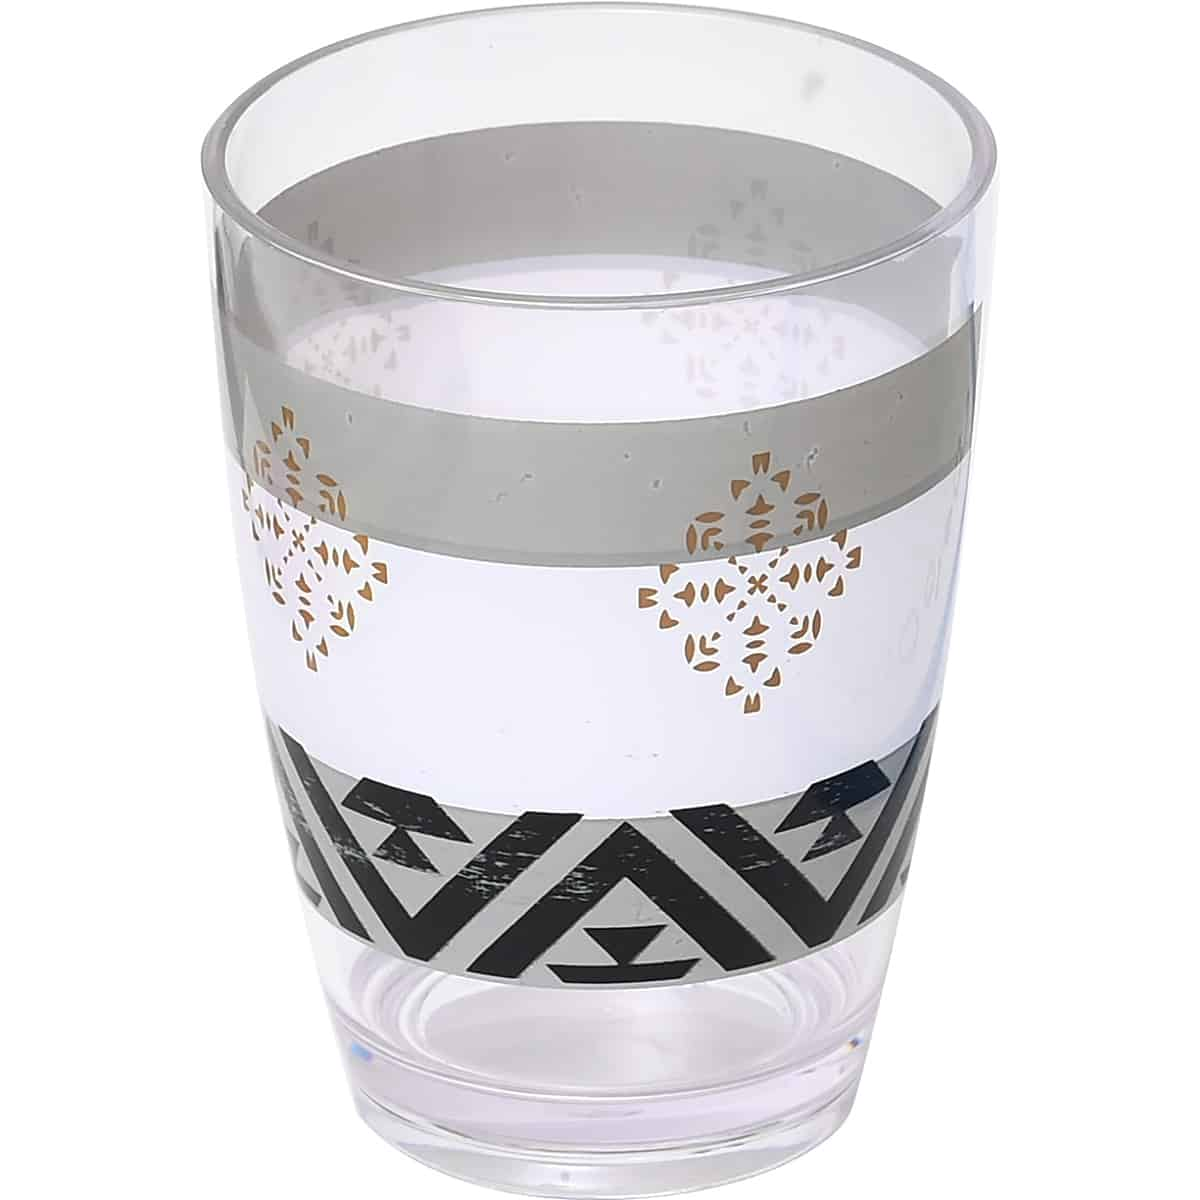 Kenya Printed Bath Water Tumbler Clear Acrylic